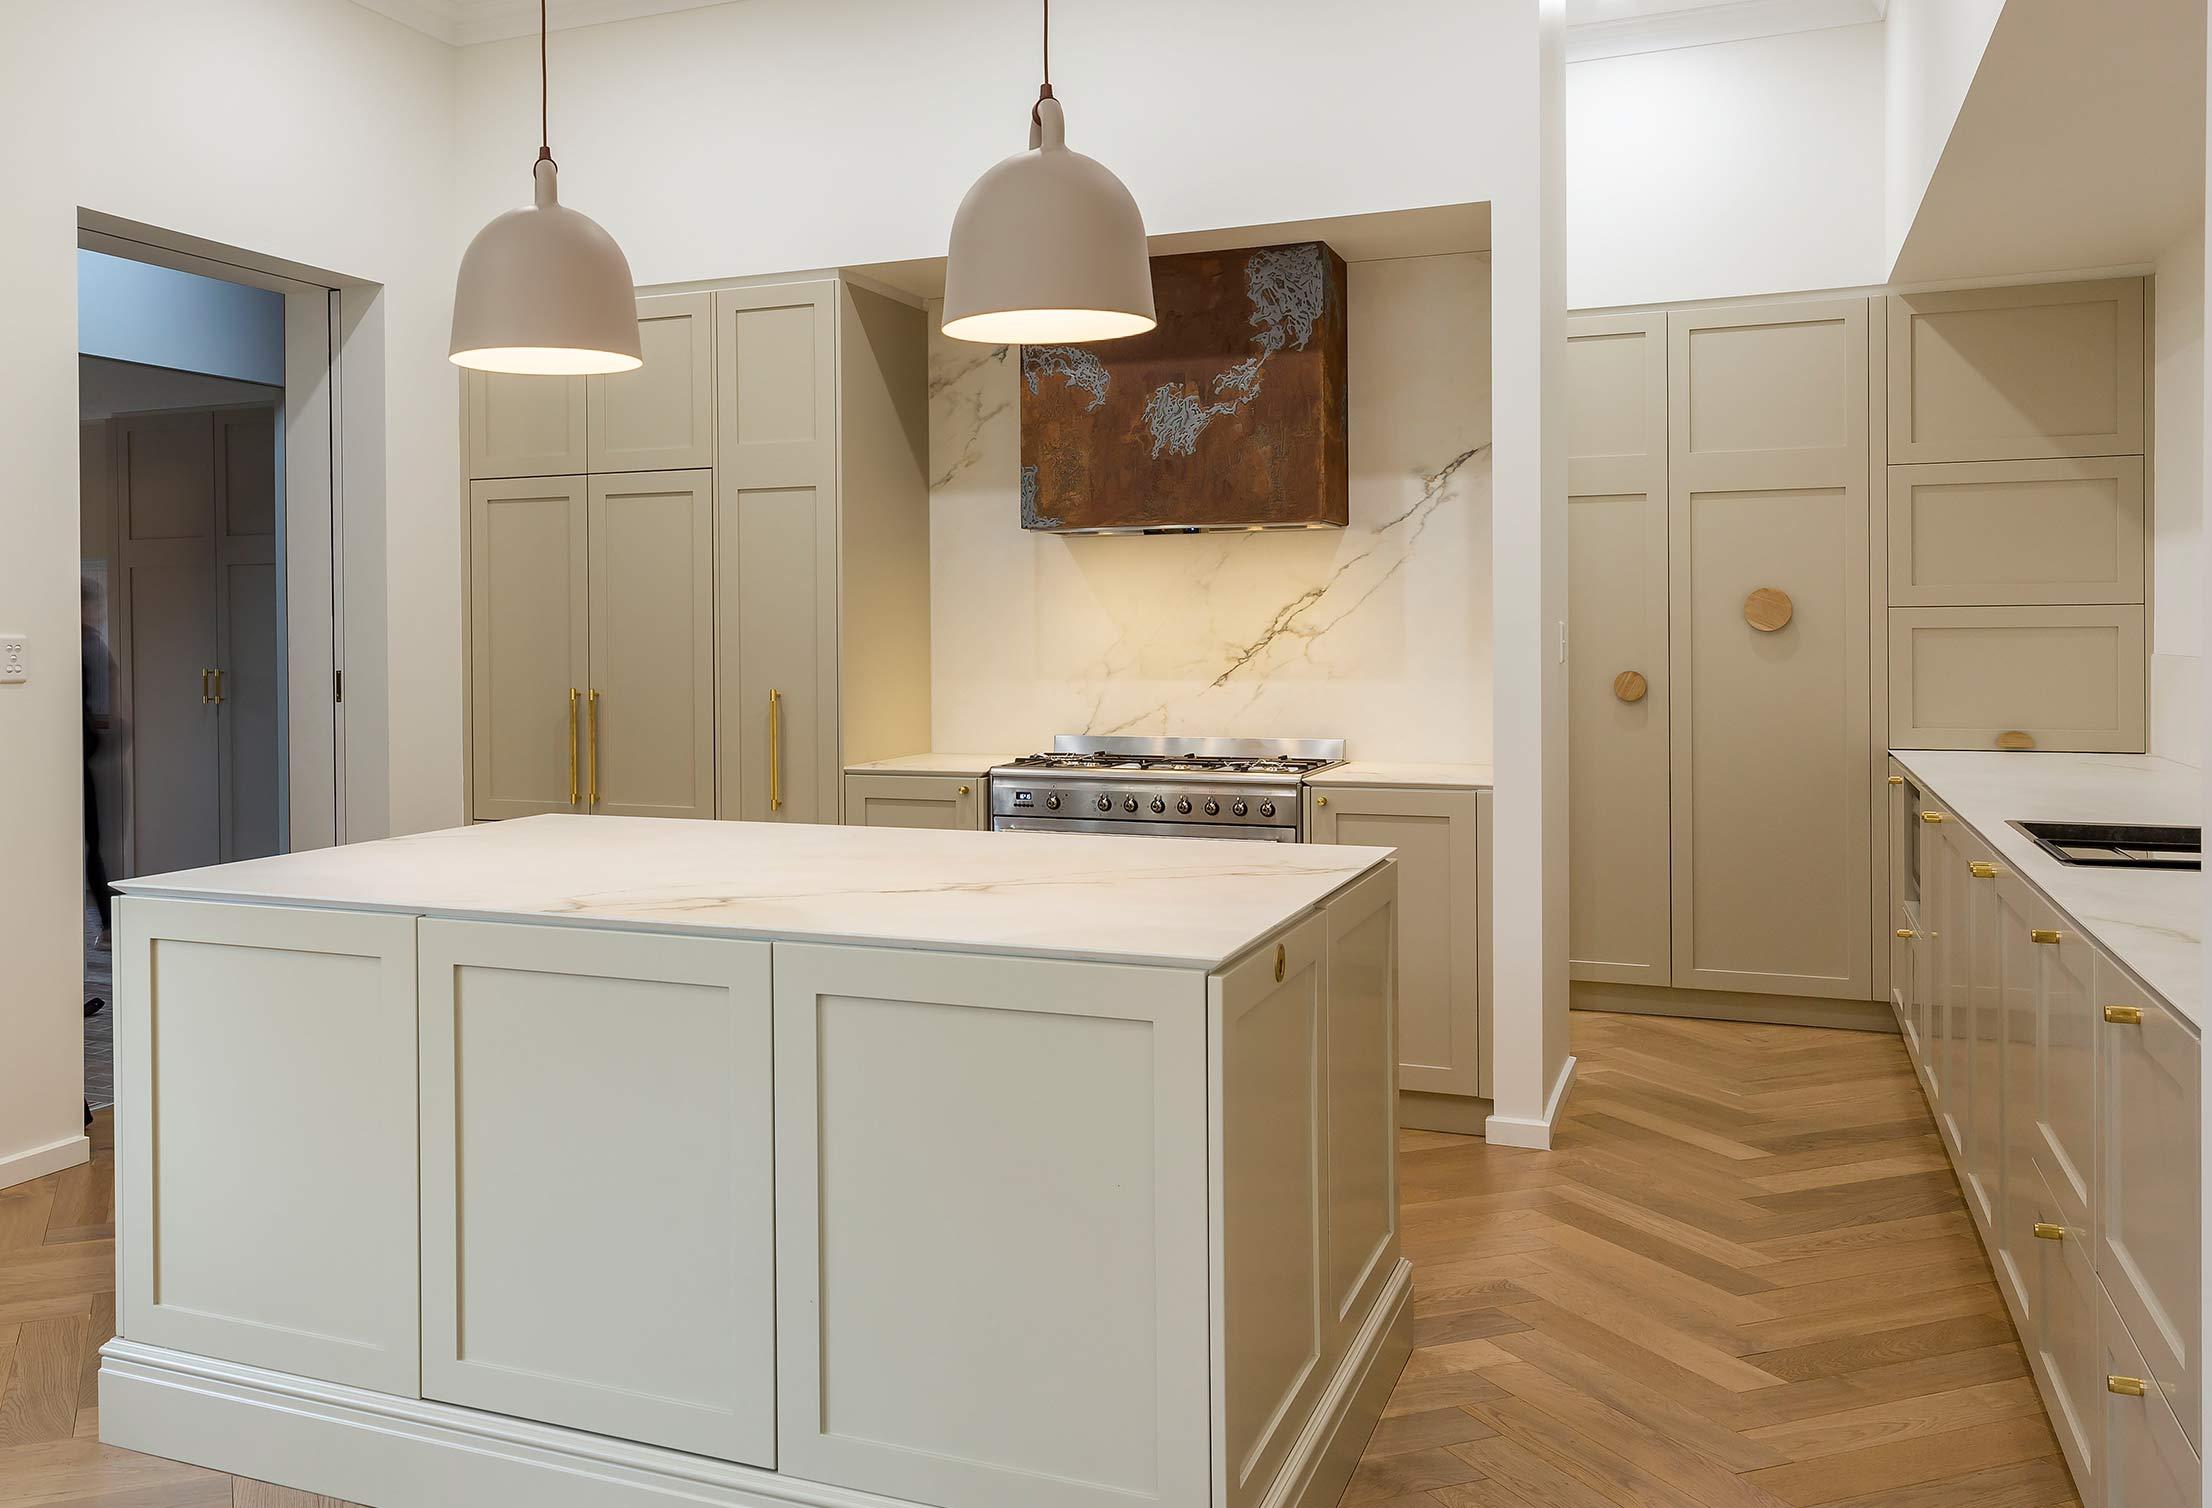 turnbull-built-renovation-kitchen-dining-goodwood-sa.jpg